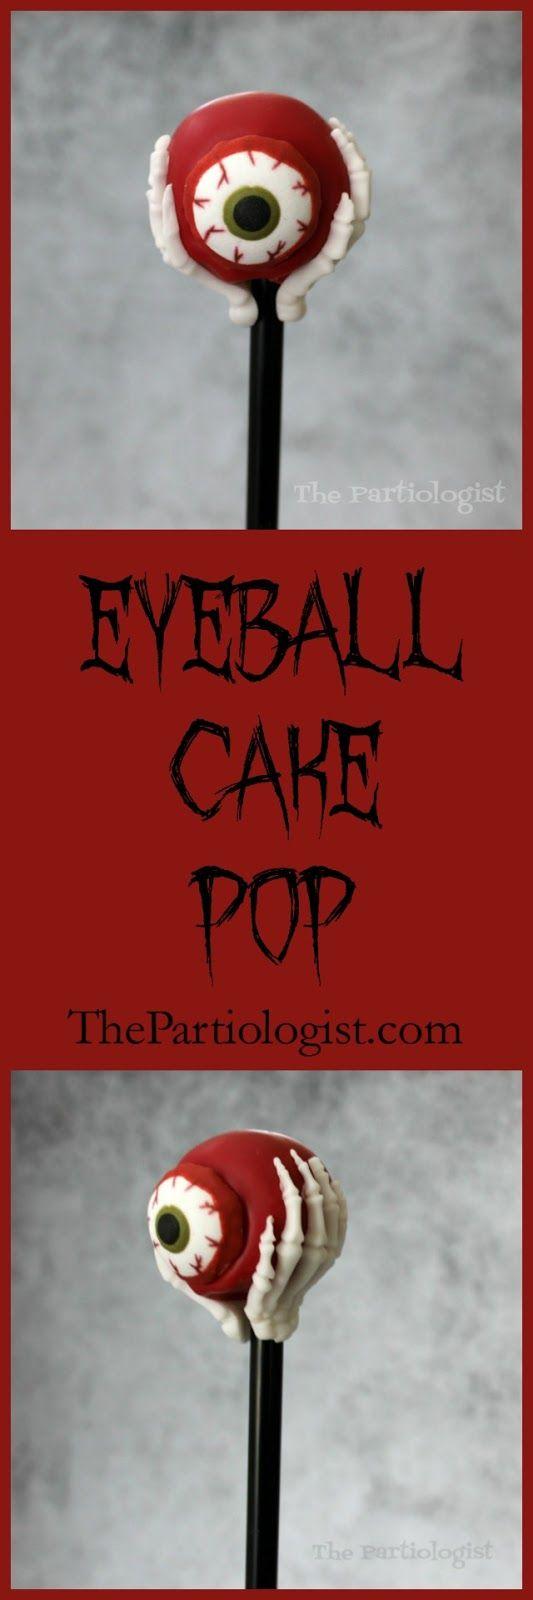 The Partiologist: Creepy Eye Cake Pop!